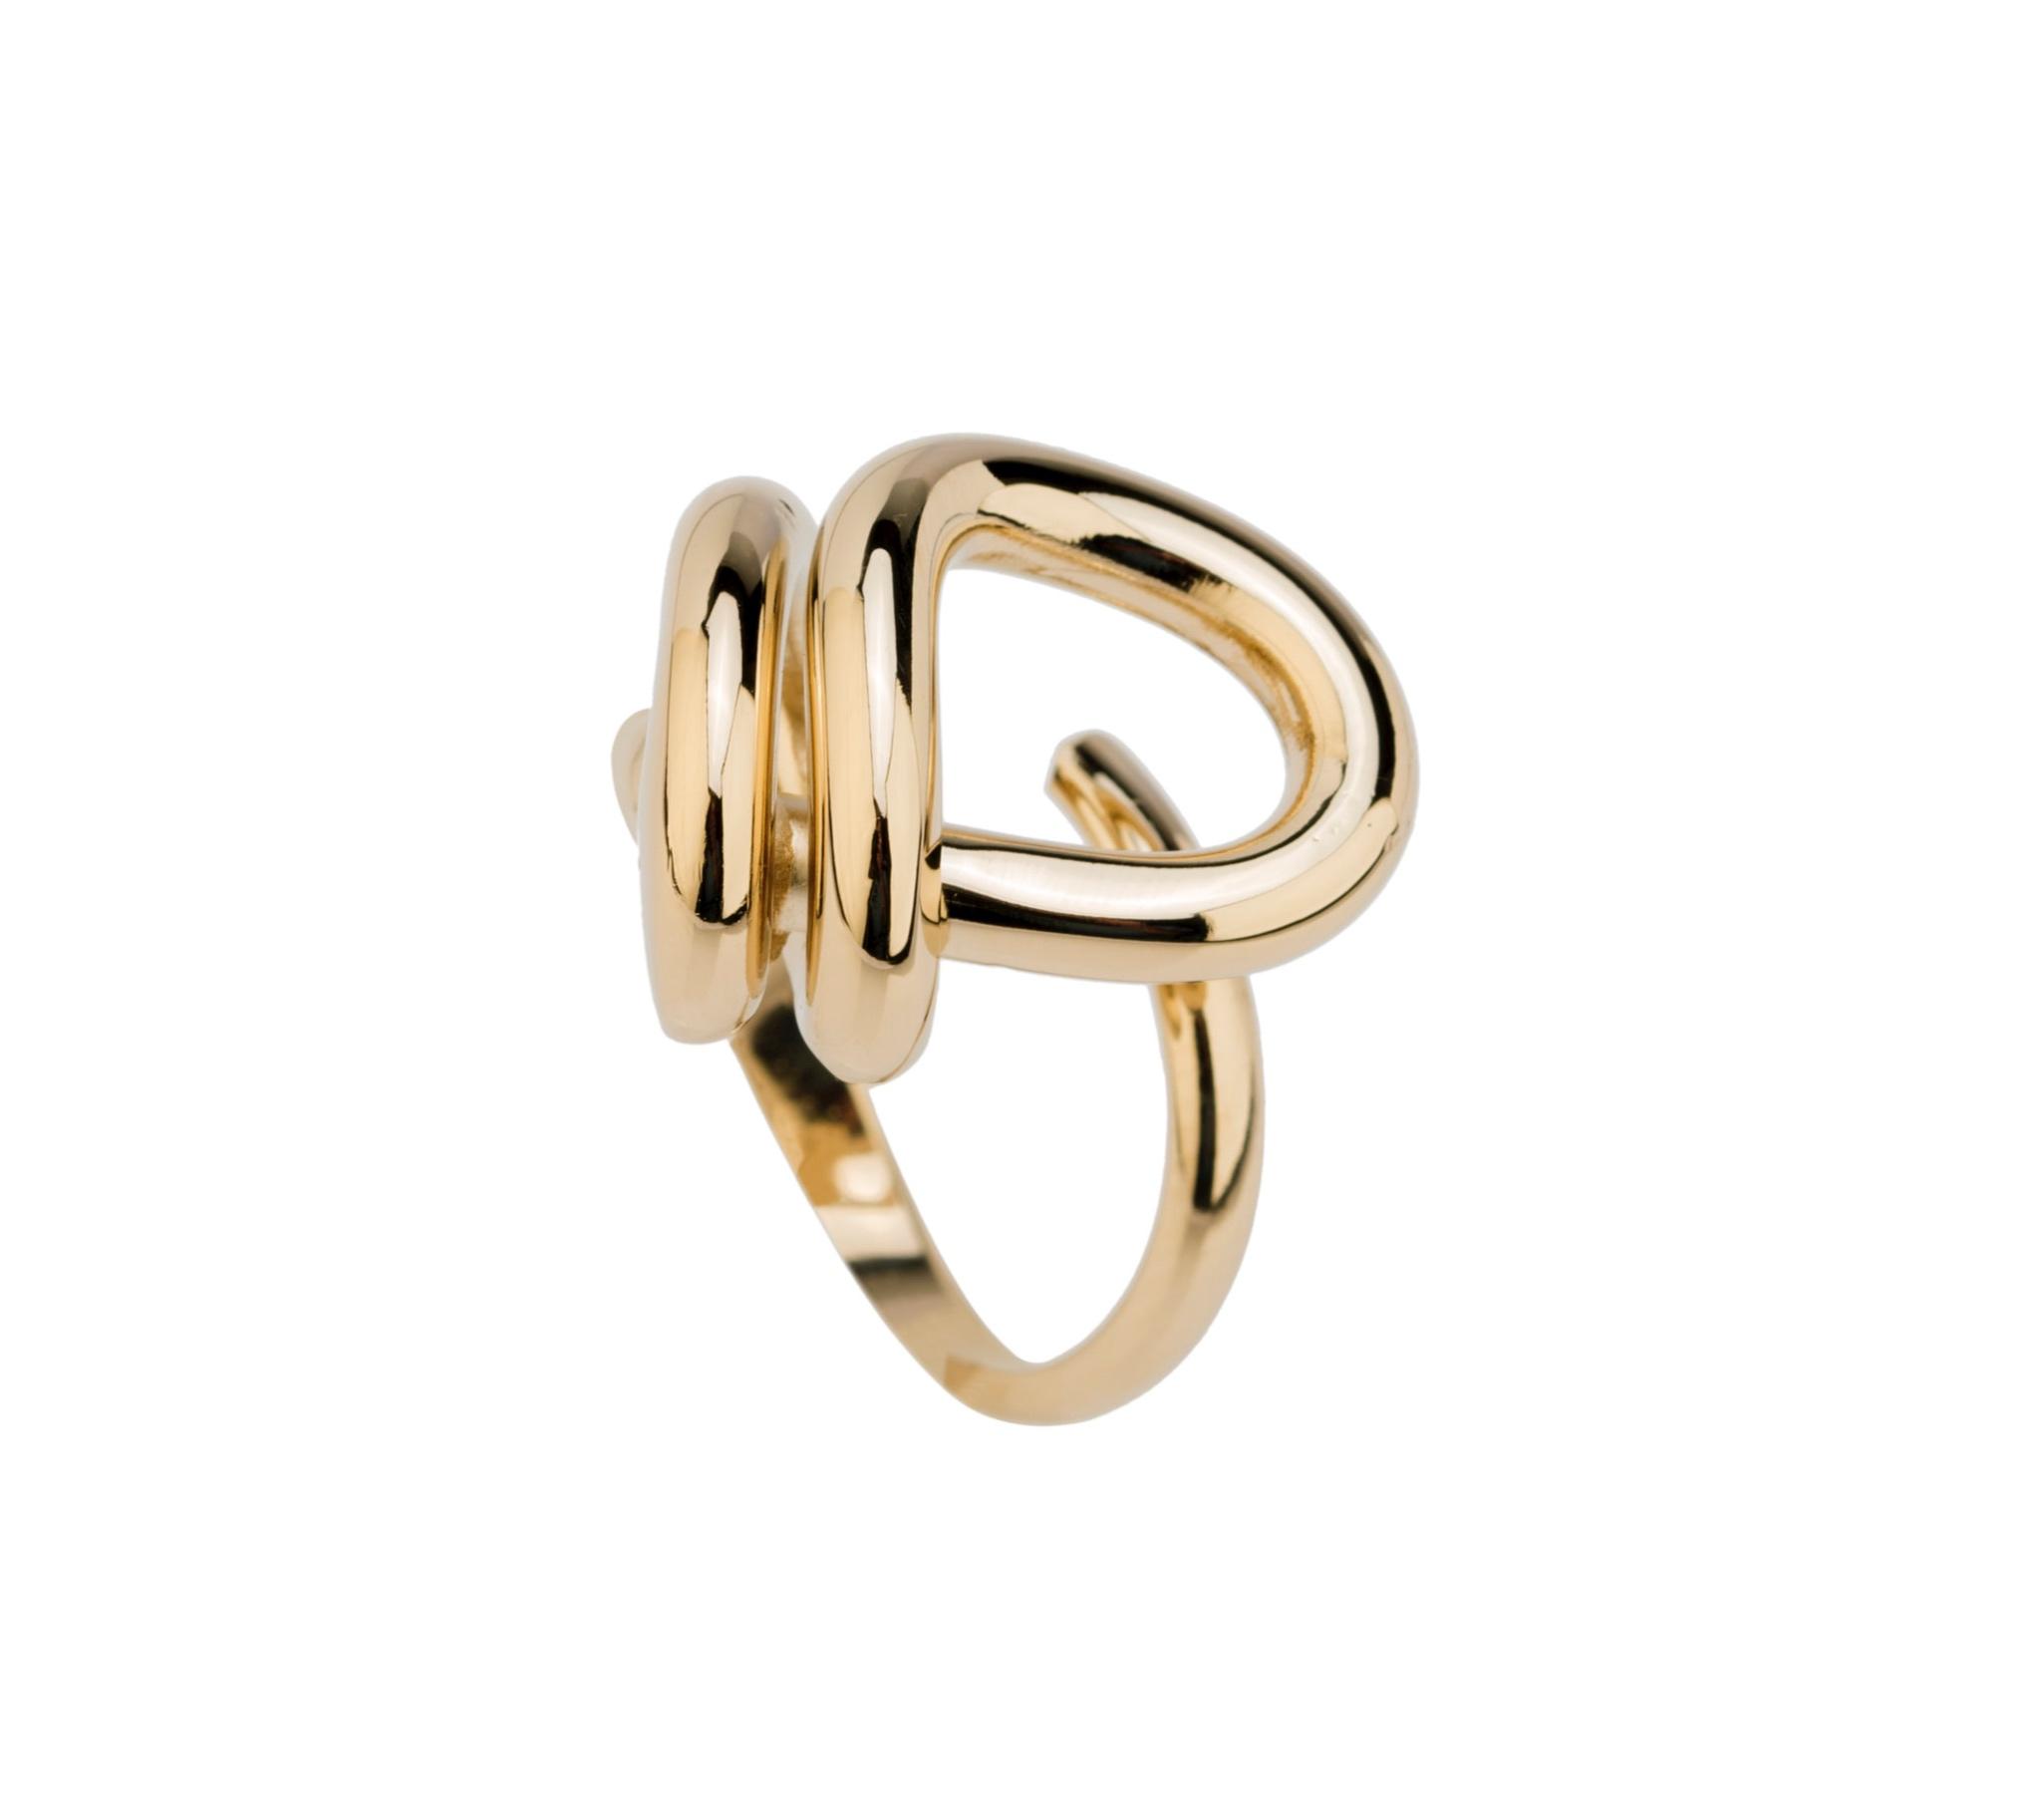 KNOT+RING+GOLD.jpg